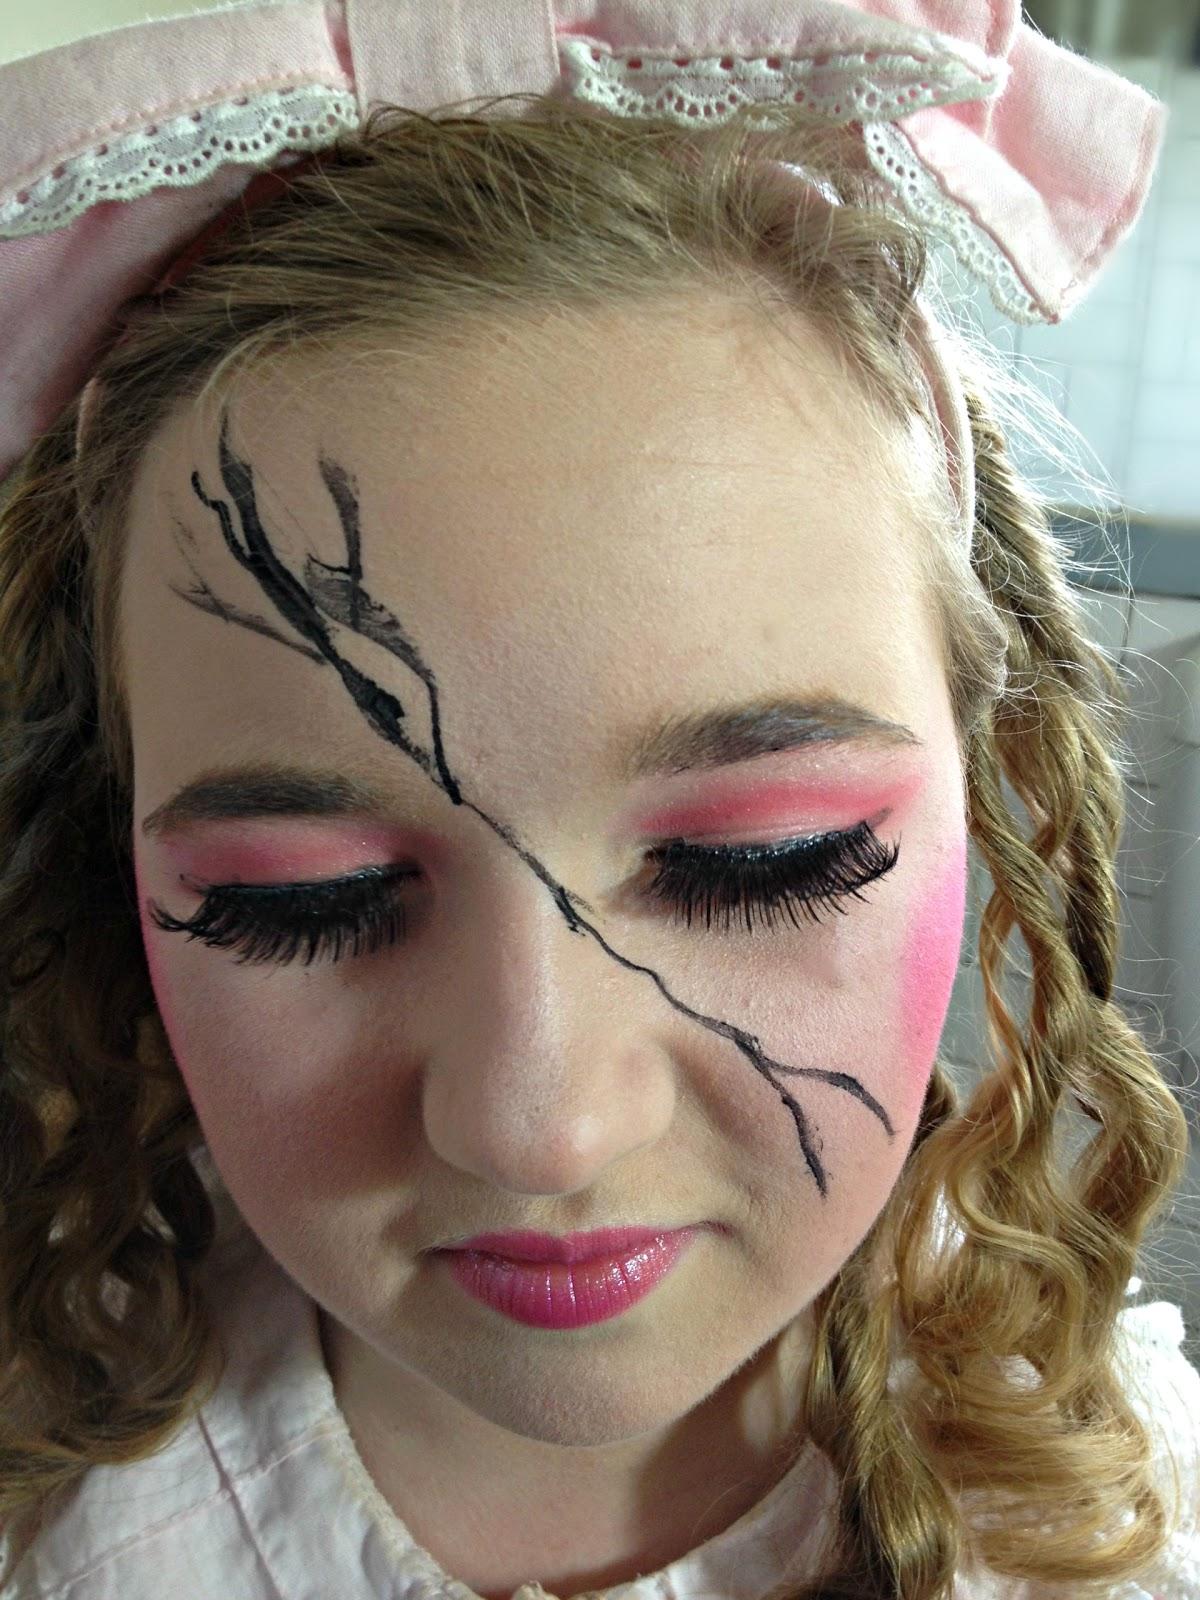 halloween makeup ideas: cracked doll - omega: fashion adjacent